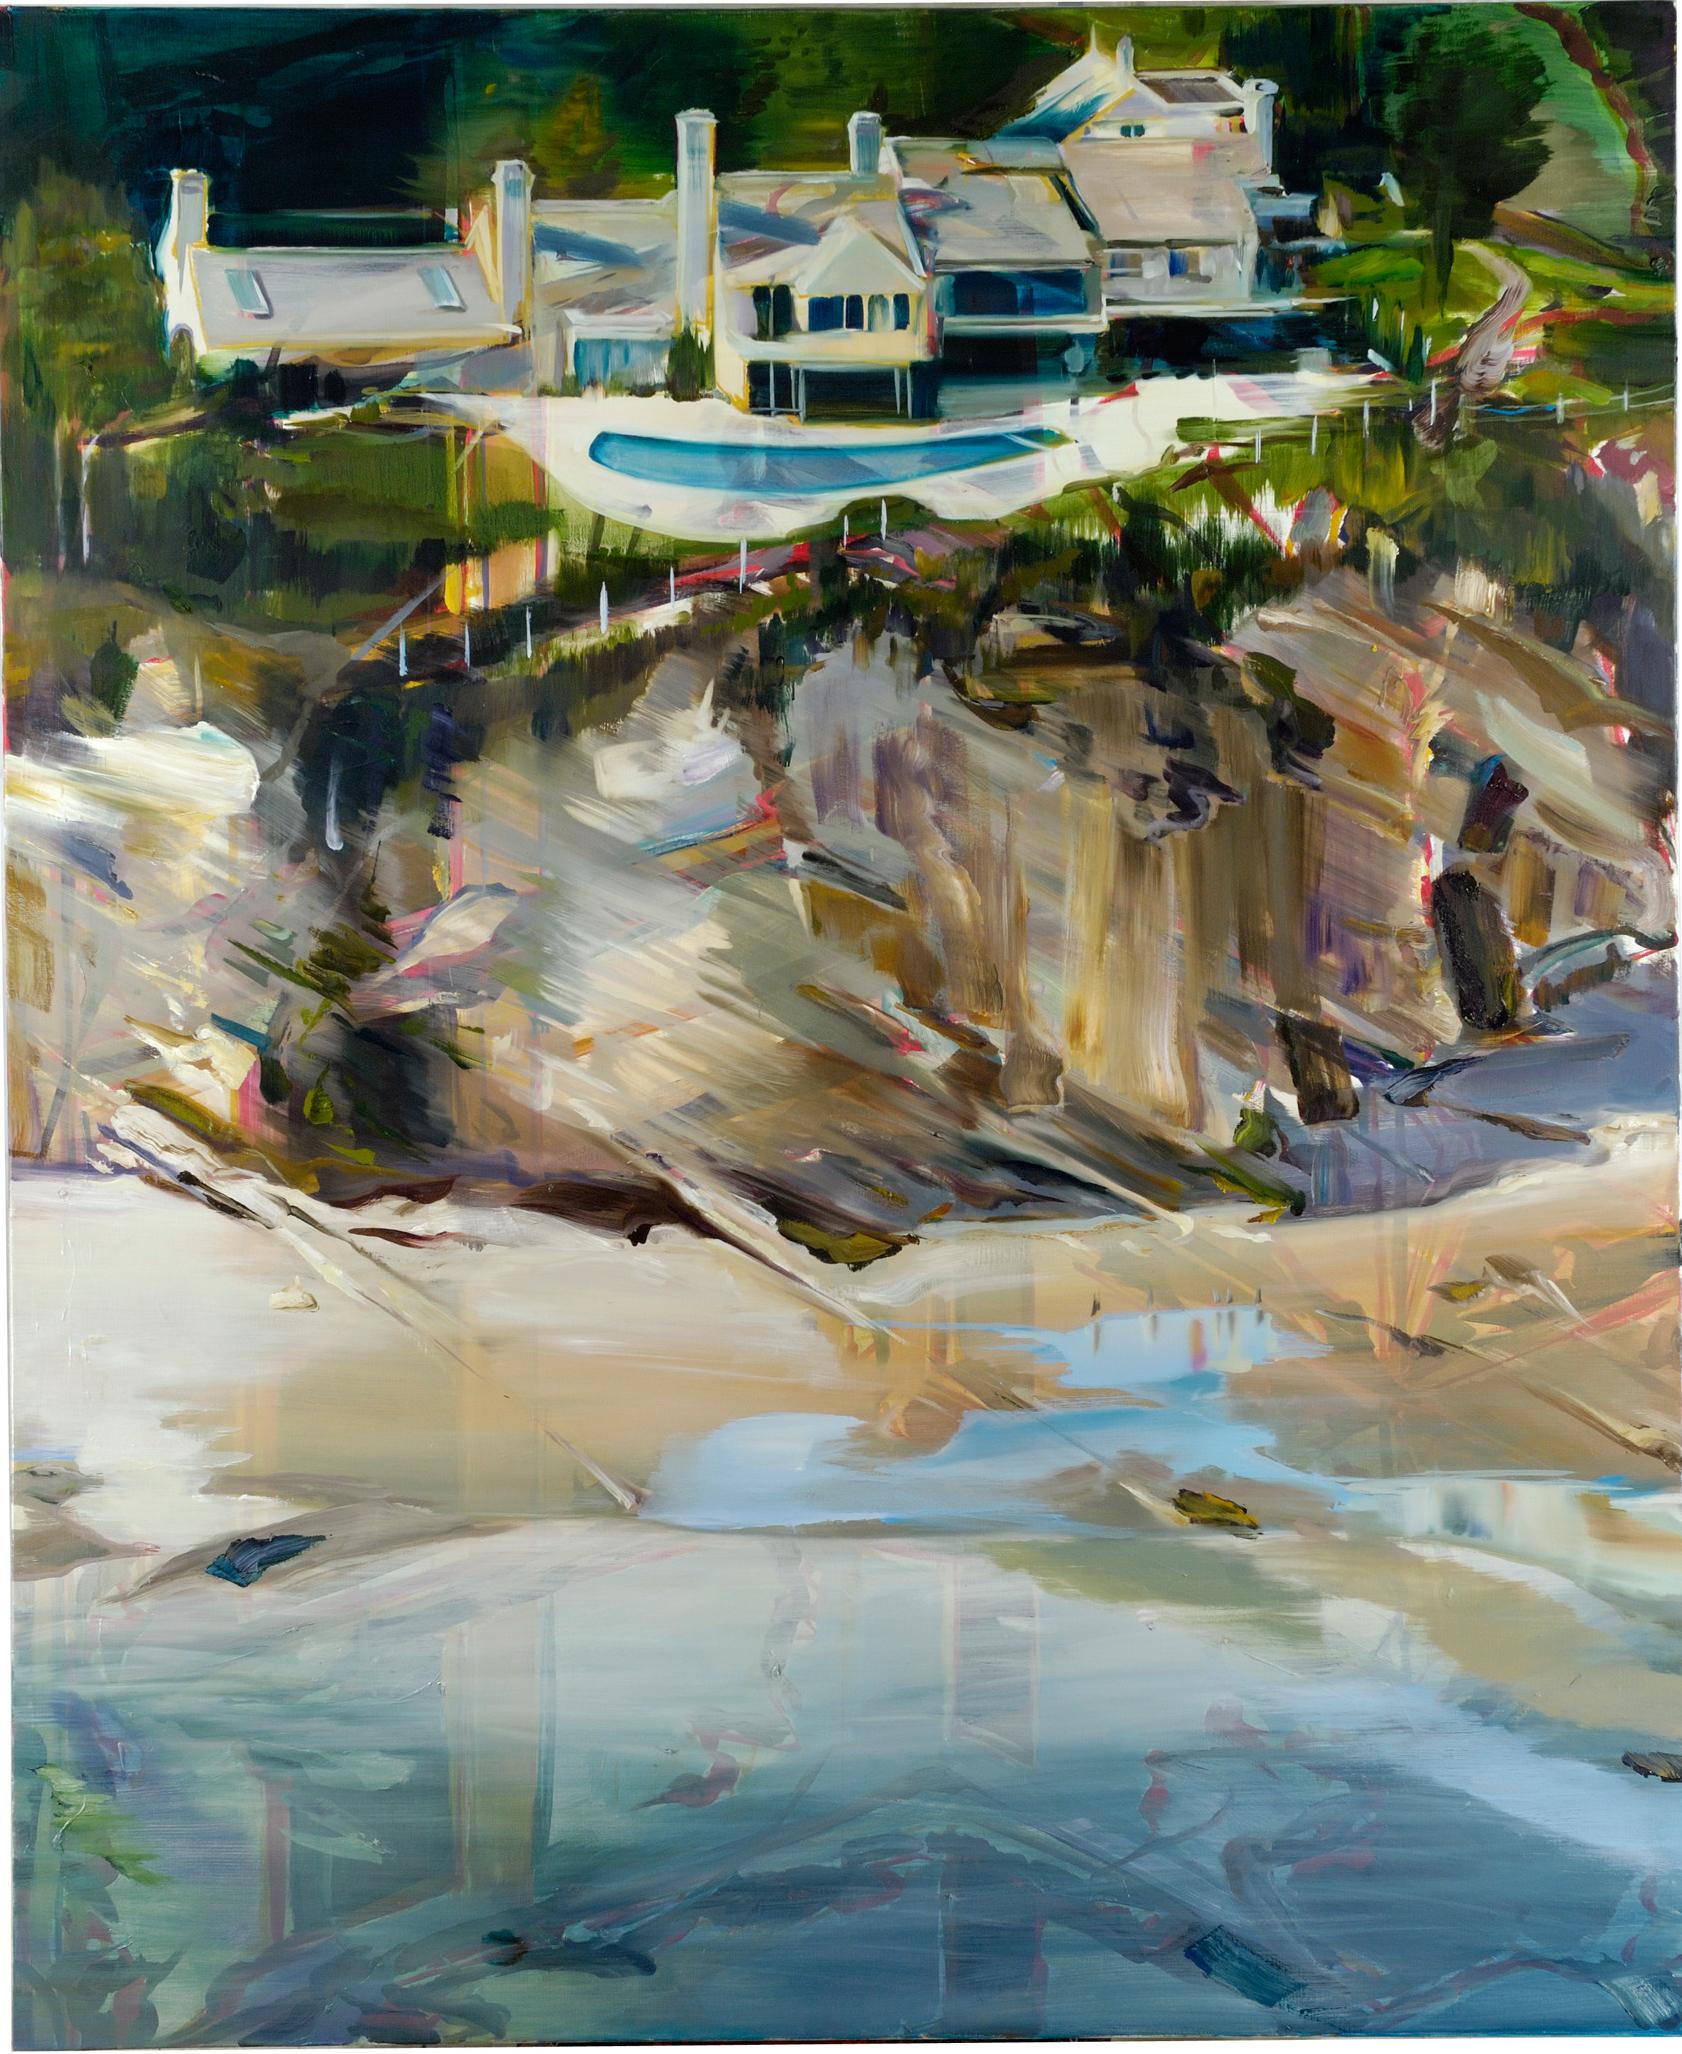 Villa Mugabe , 2009, oil on canvas, 195 x 135cm, oil on canvas. Private collection, France